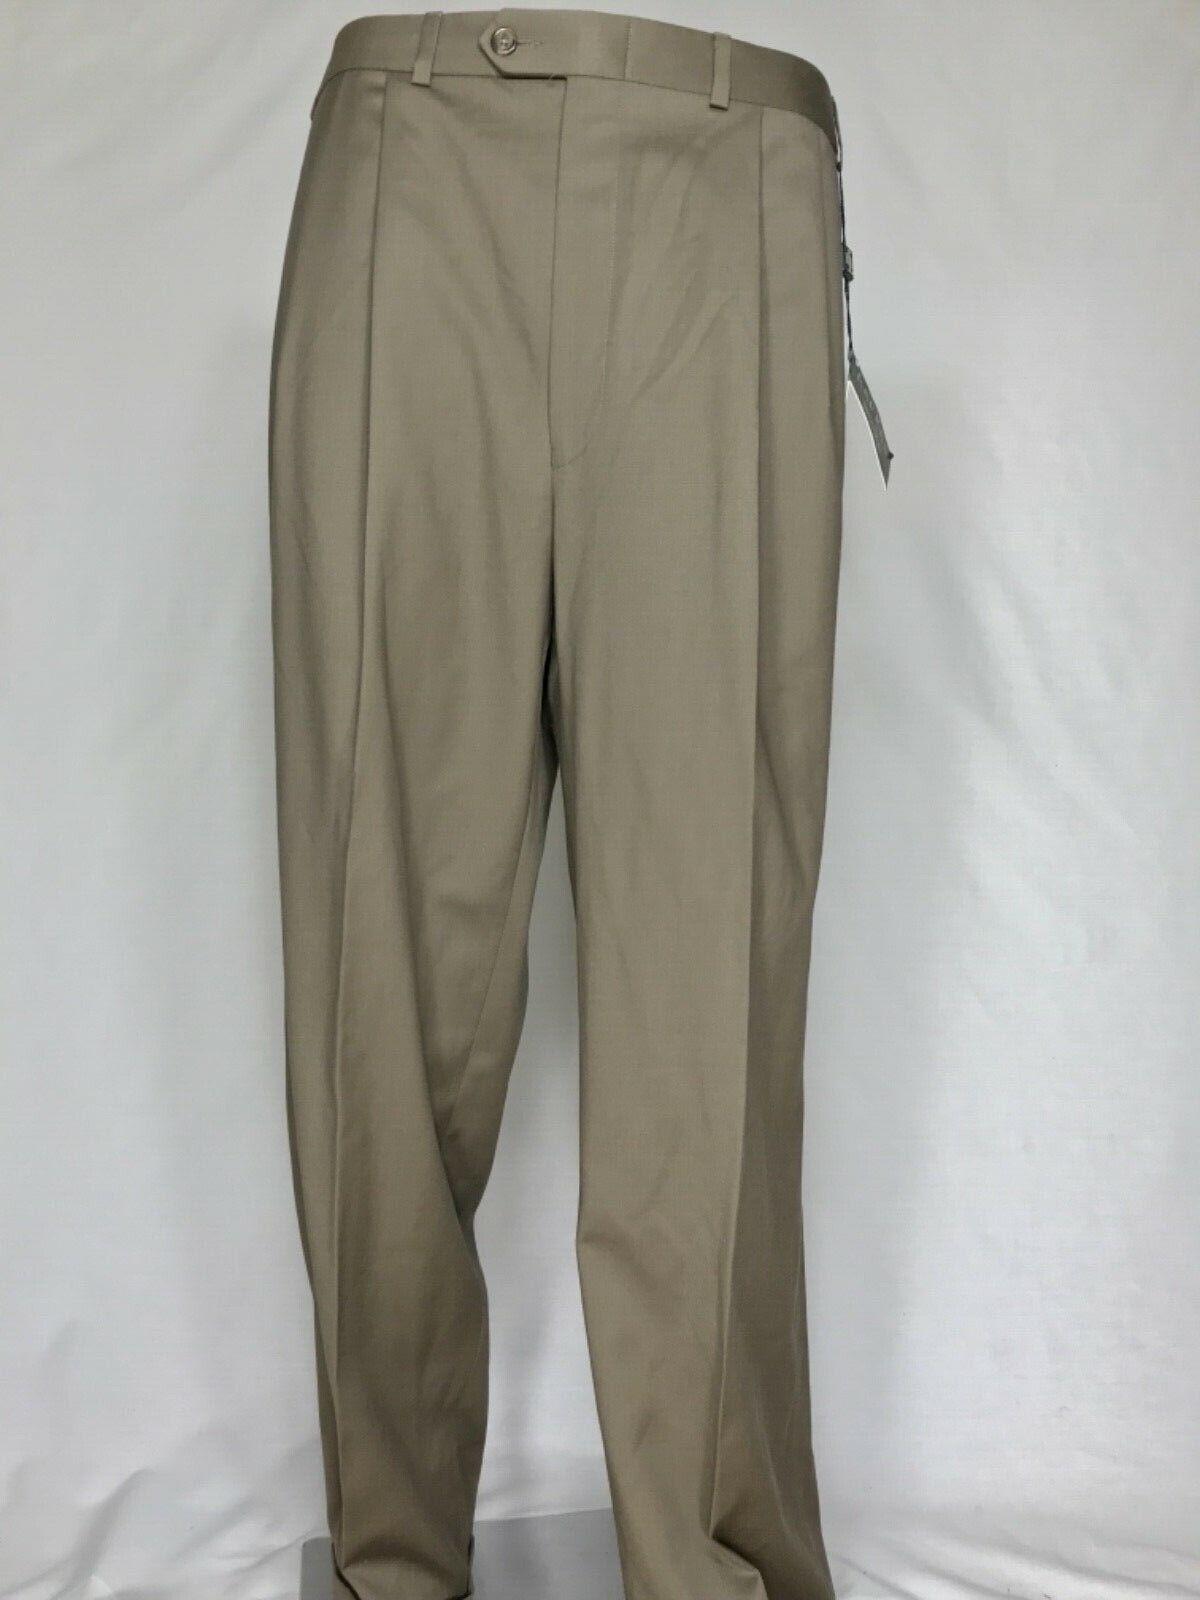 3204 NWT RALPH LAUREN Mens 36W 32L Suit Dress Pants Trousers Total Comfort Wool